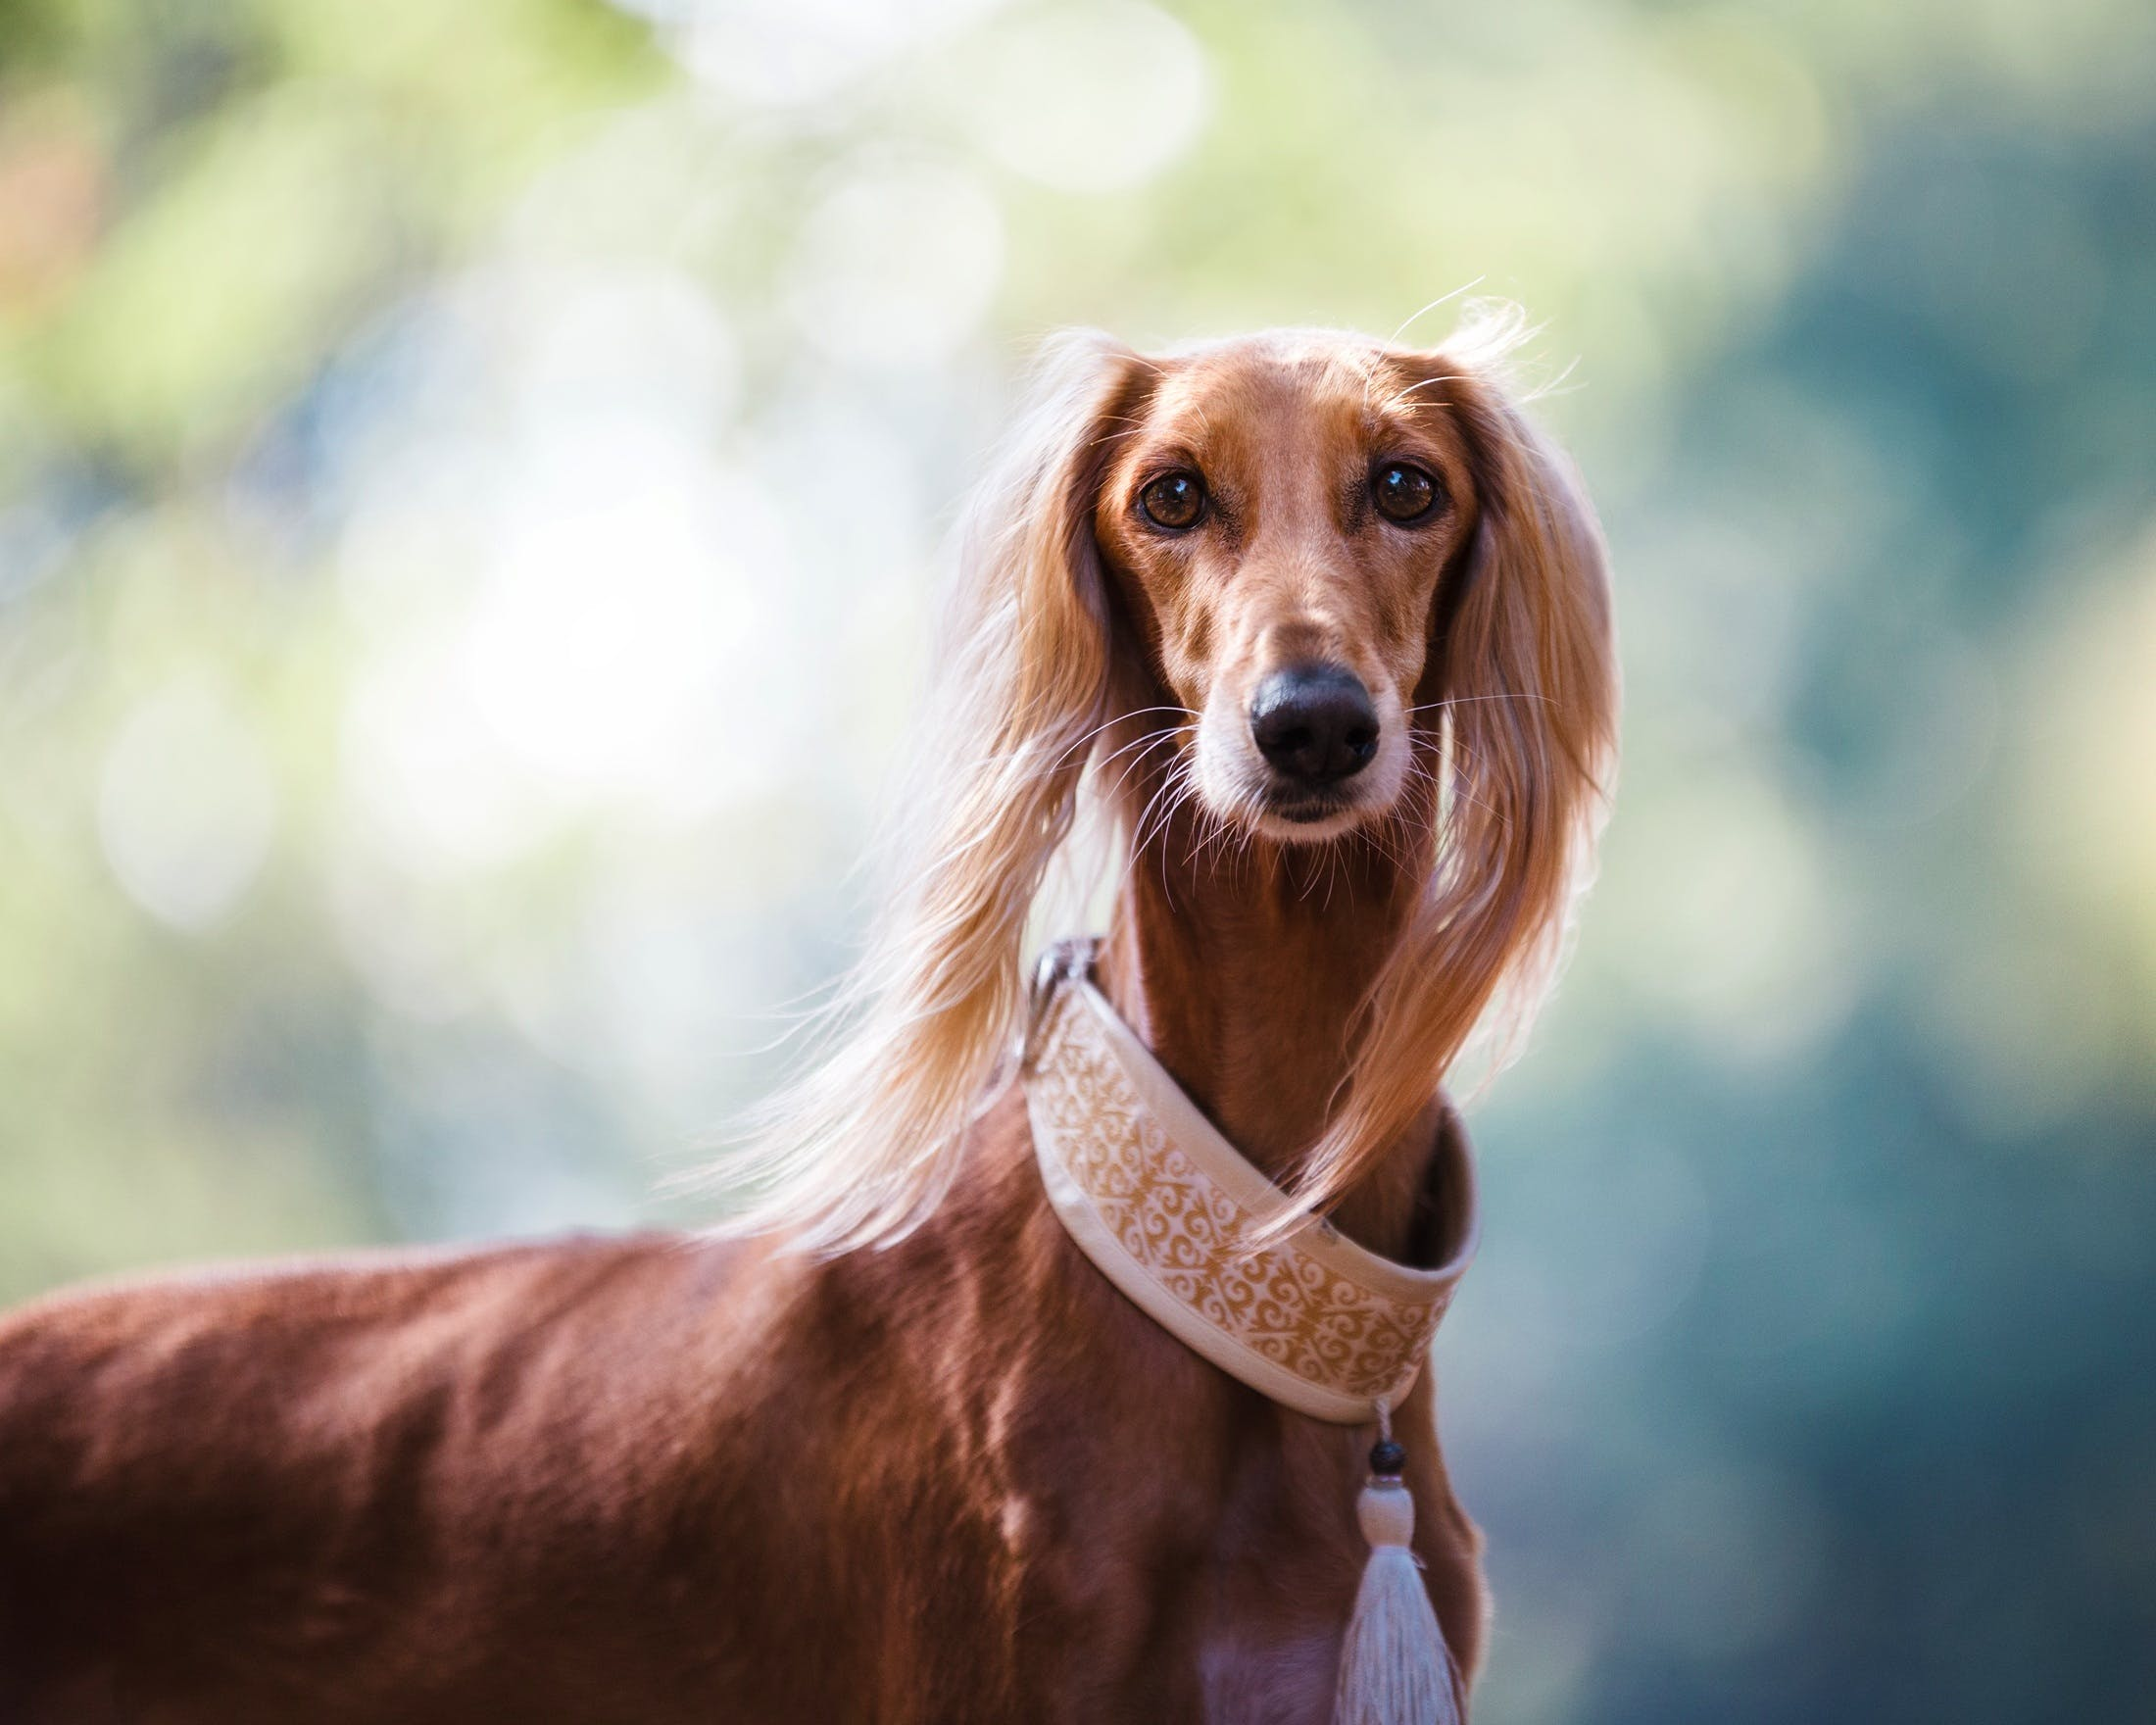 Free stock photo of nature, animal, dog, pet